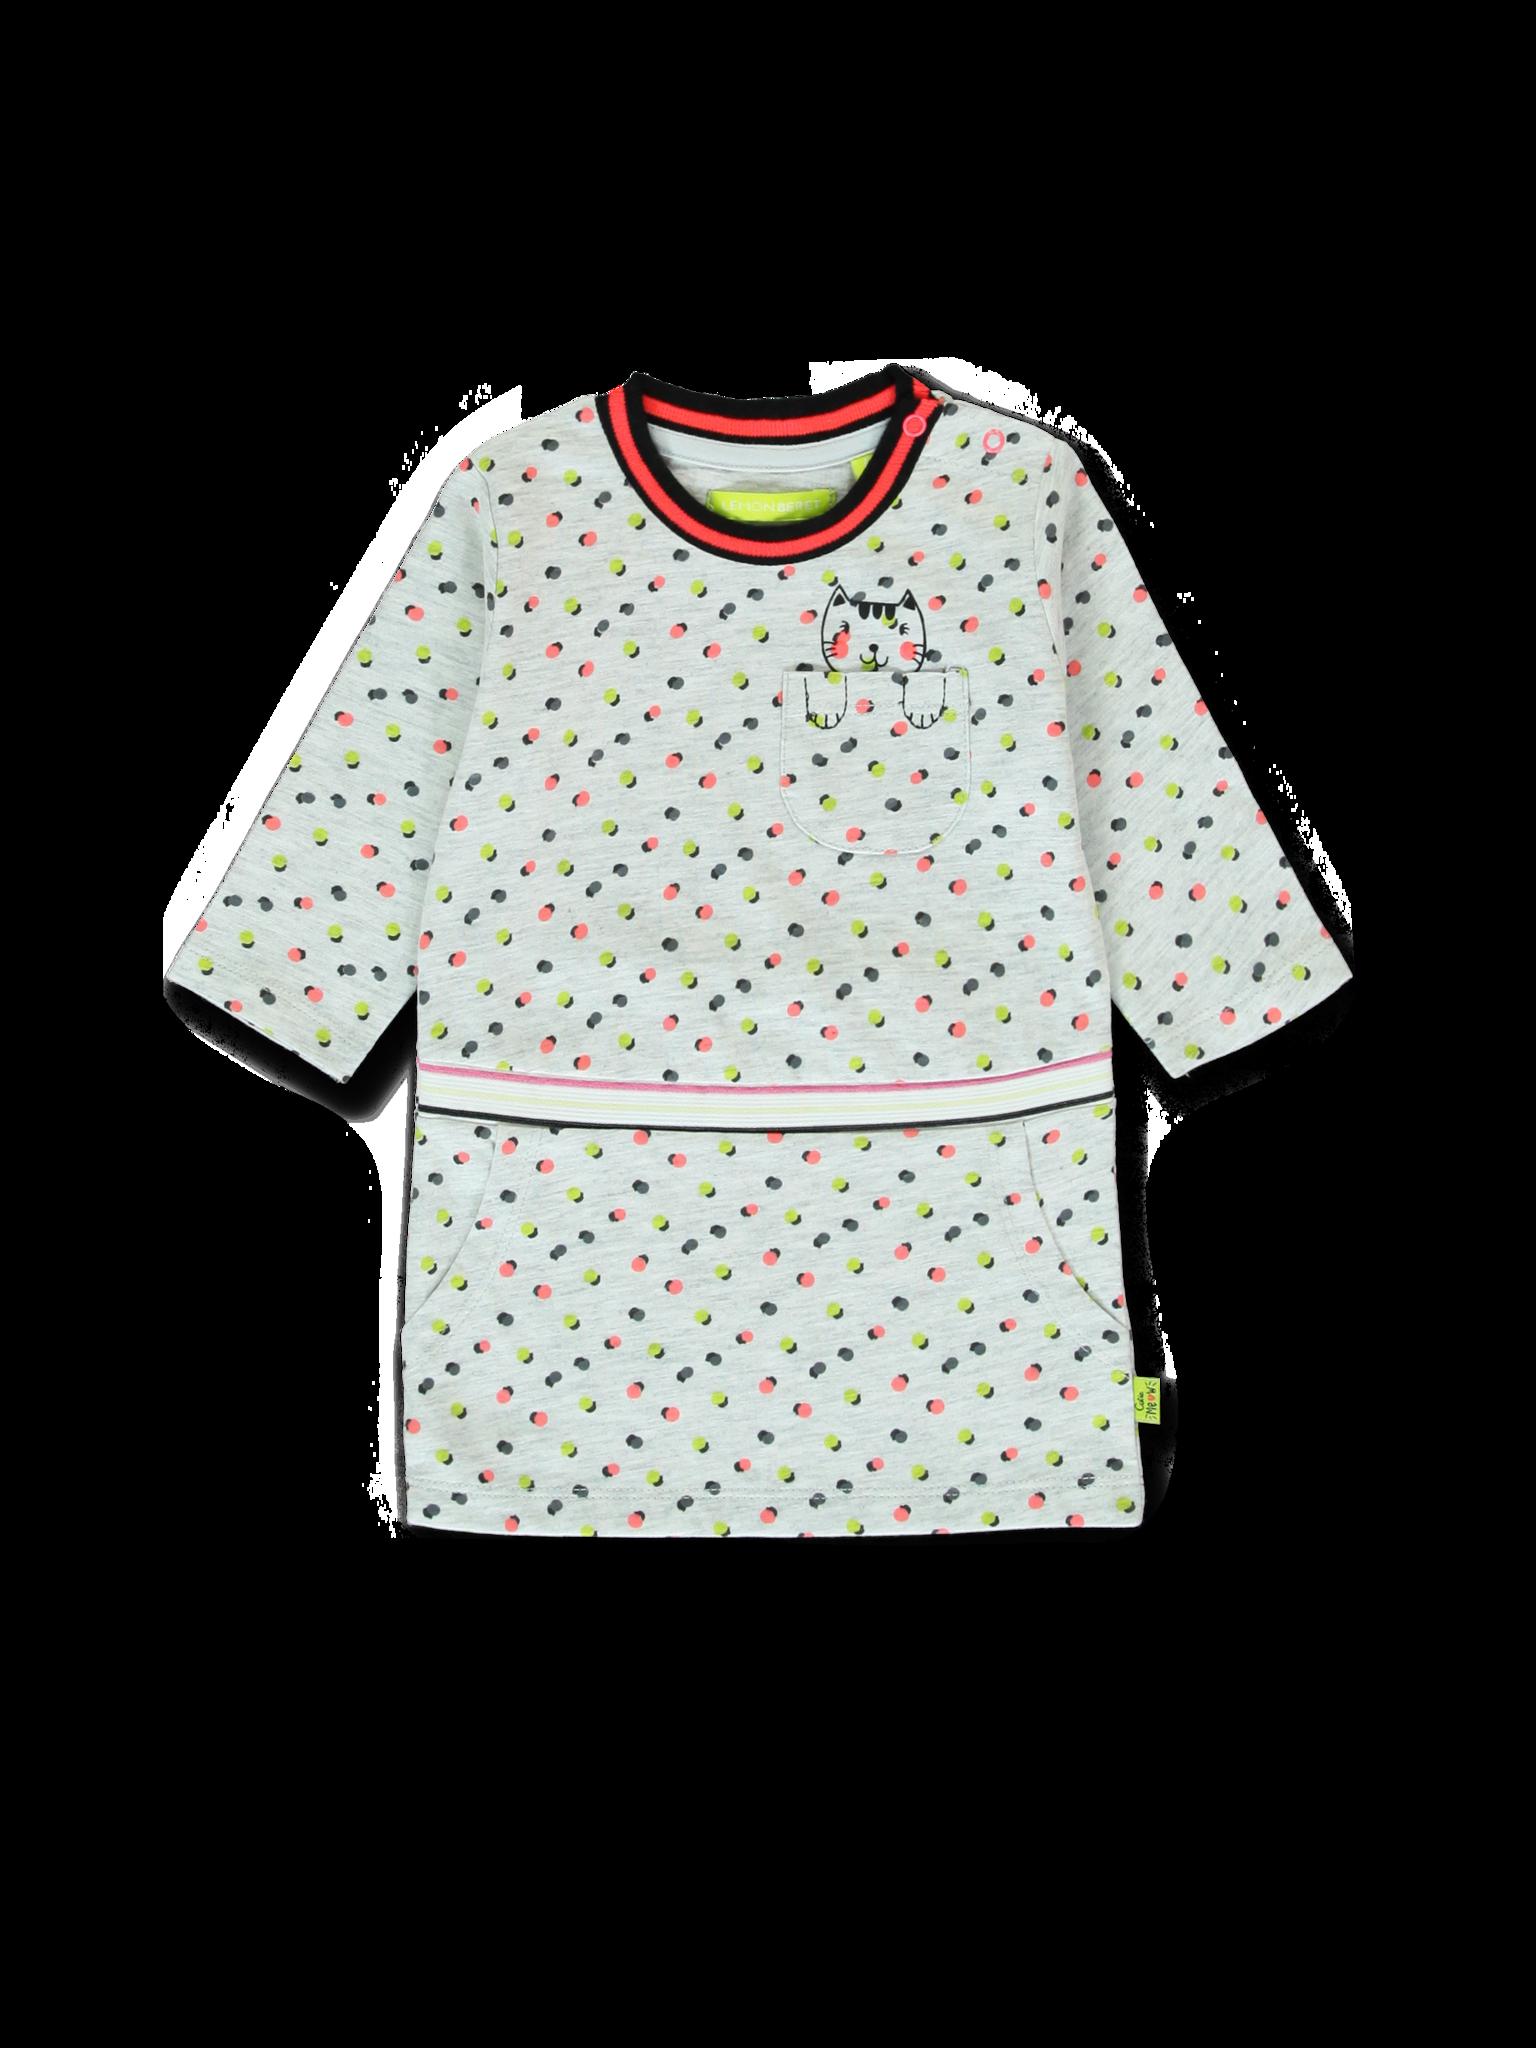 Lemon Beret | Winter 2019 Baby | Dress | 8 pcs/box